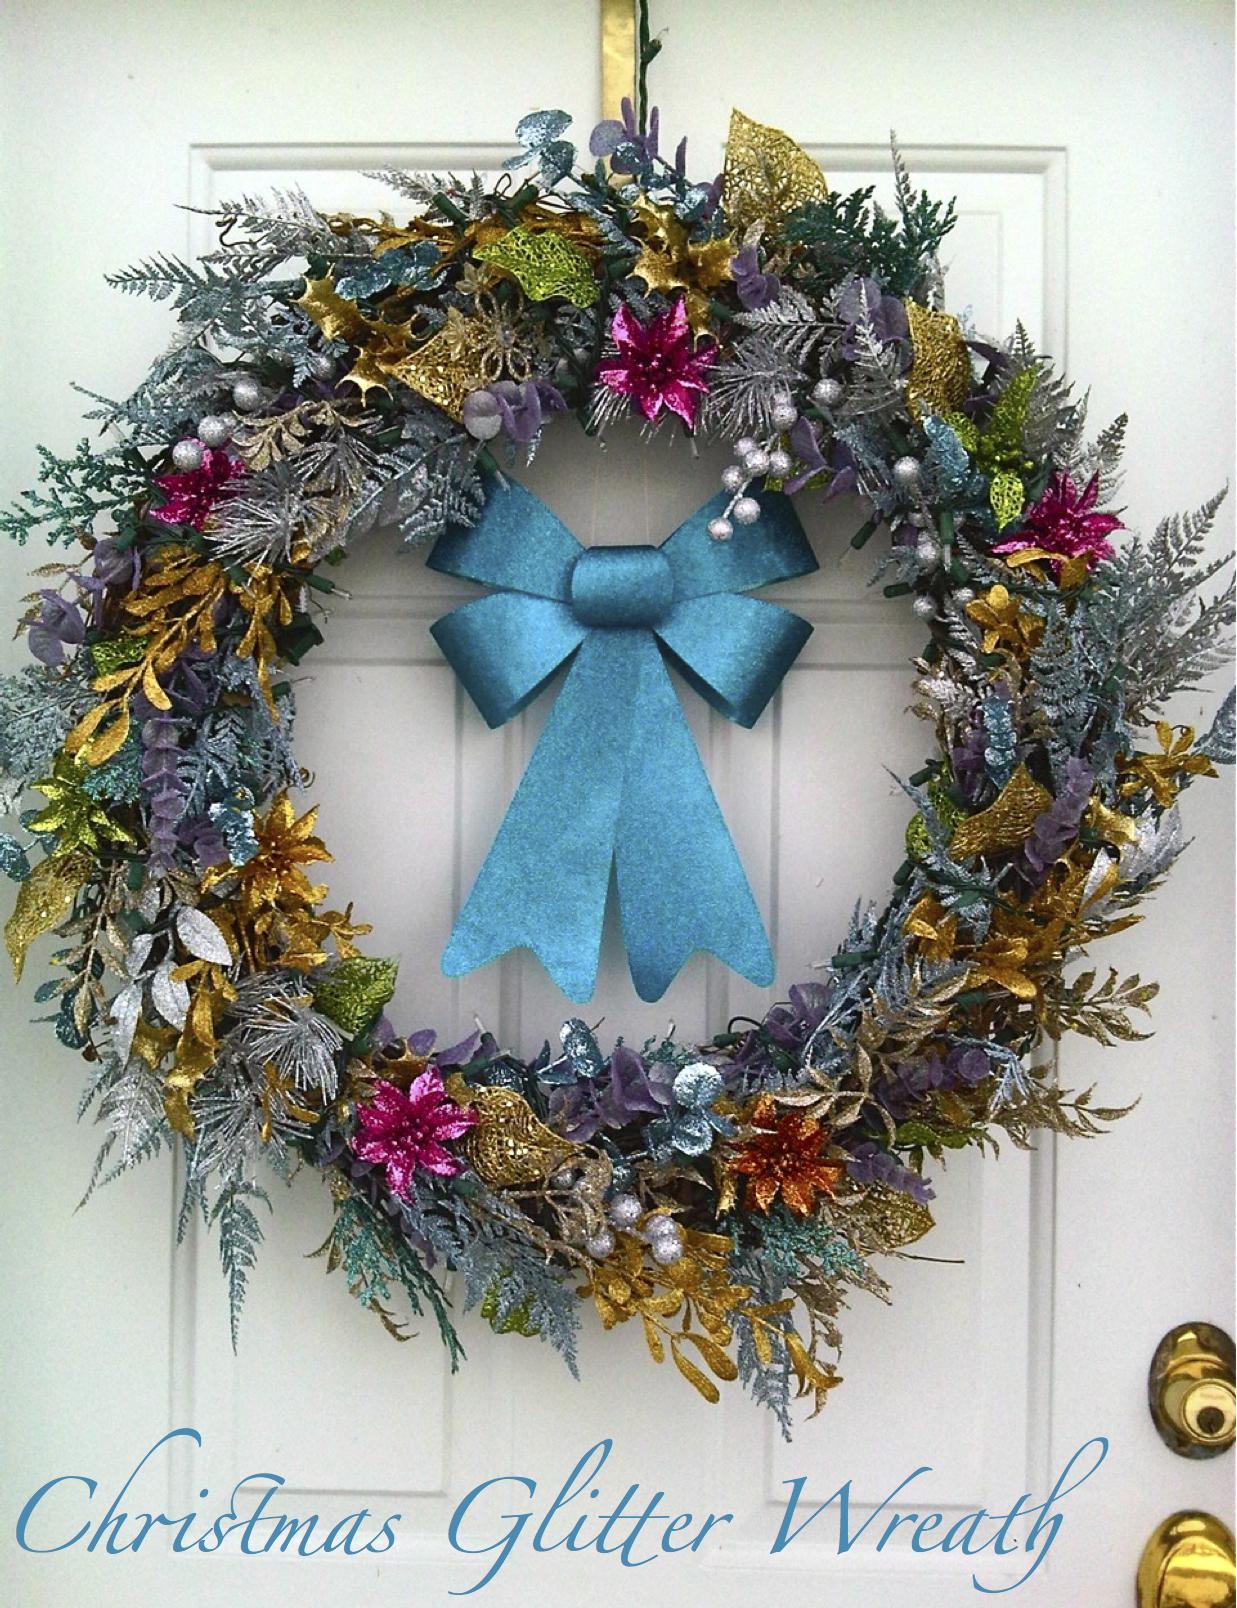 Christmas Glitter Wreath |